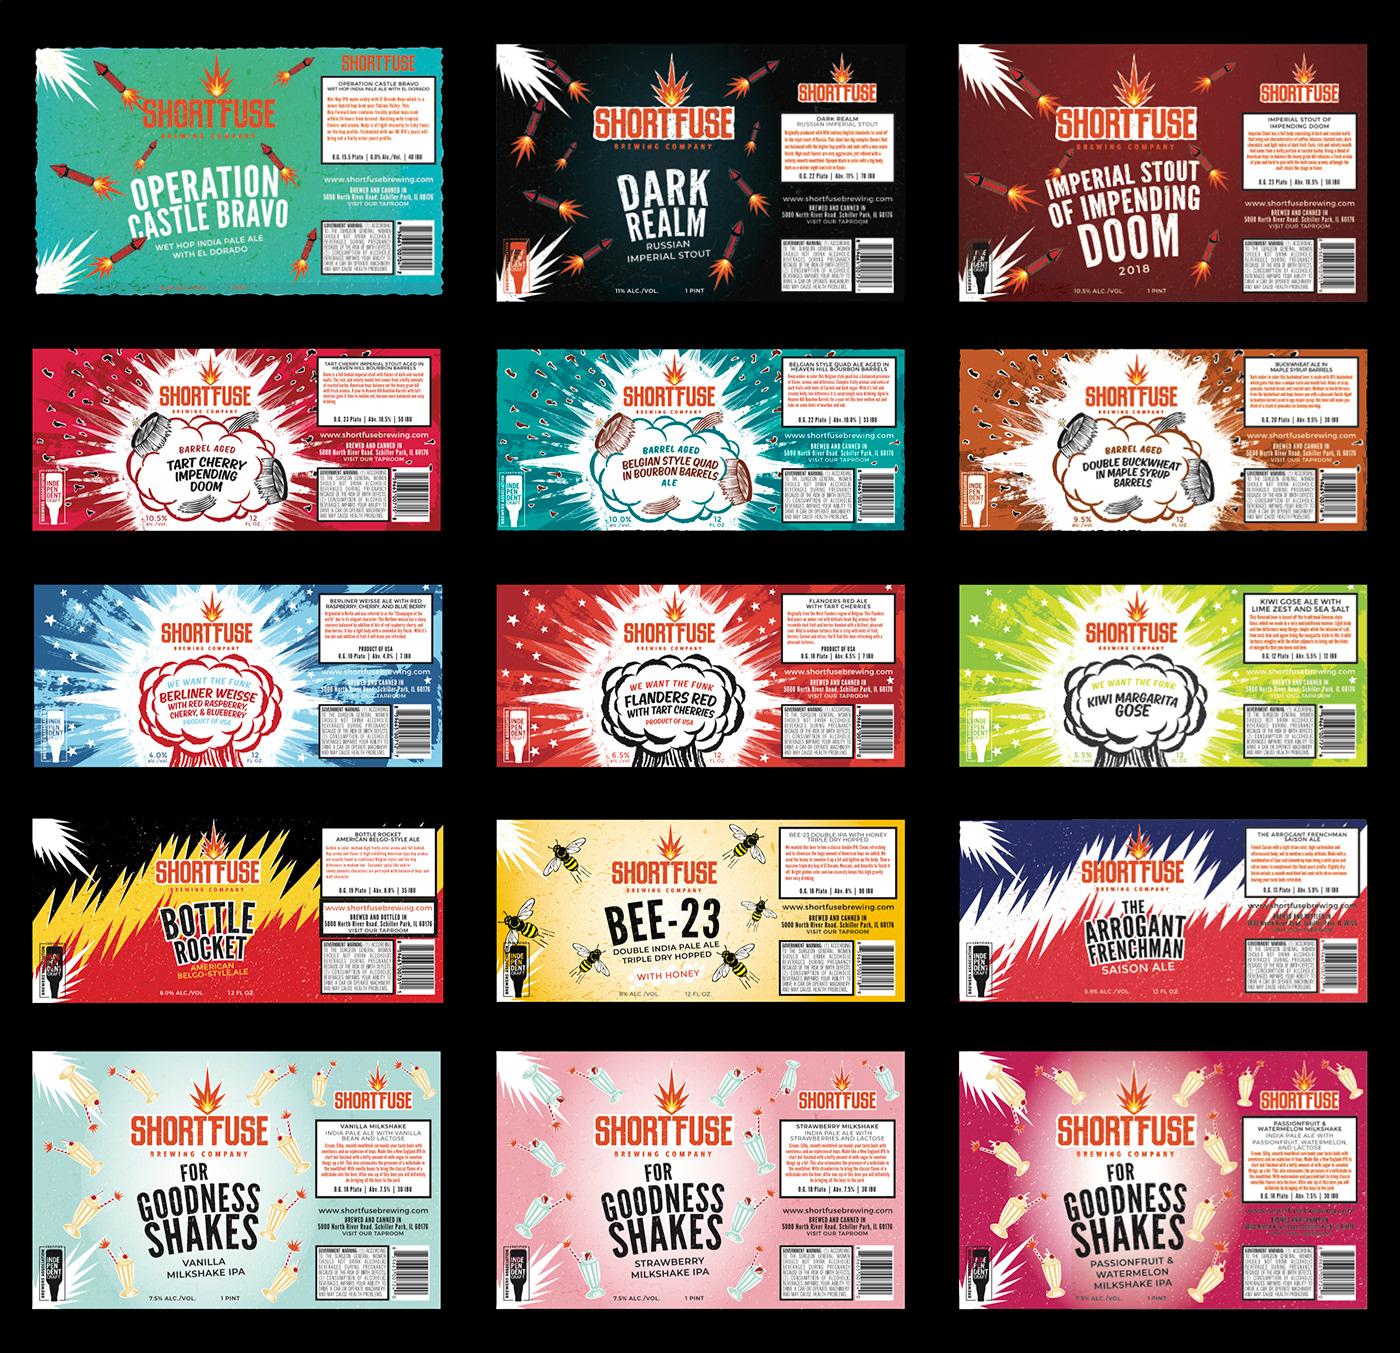 #shortfuse #shortfusebrewing #chicago #fireworks #explosion #explosive #vintage #IPA #IPAbomb #hopbomb #craftbeer #beerlabel #labeldesign #packaging #packagingdesign #illustration